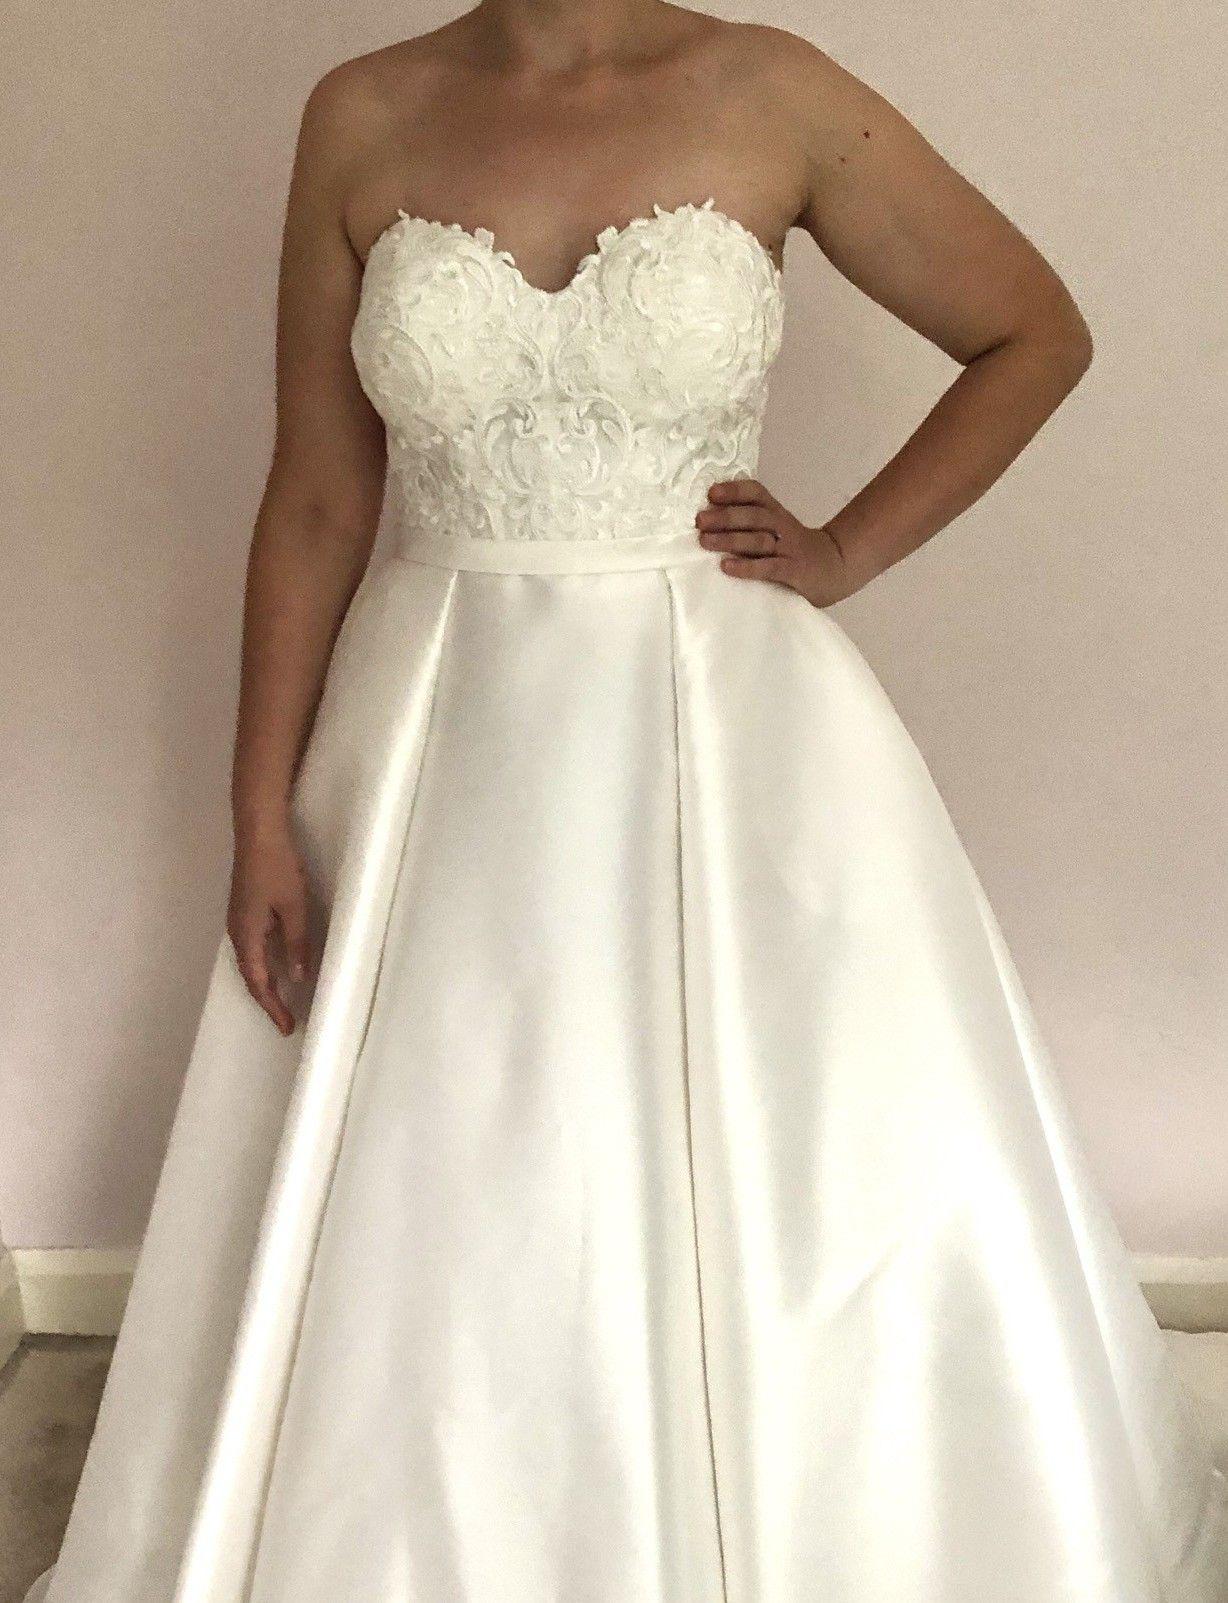 Stella York 6763 New Wedding Dress Save 31 New Wedding Dresses Stella York Wedding Dress Dresses [ 1603 x 1228 Pixel ]